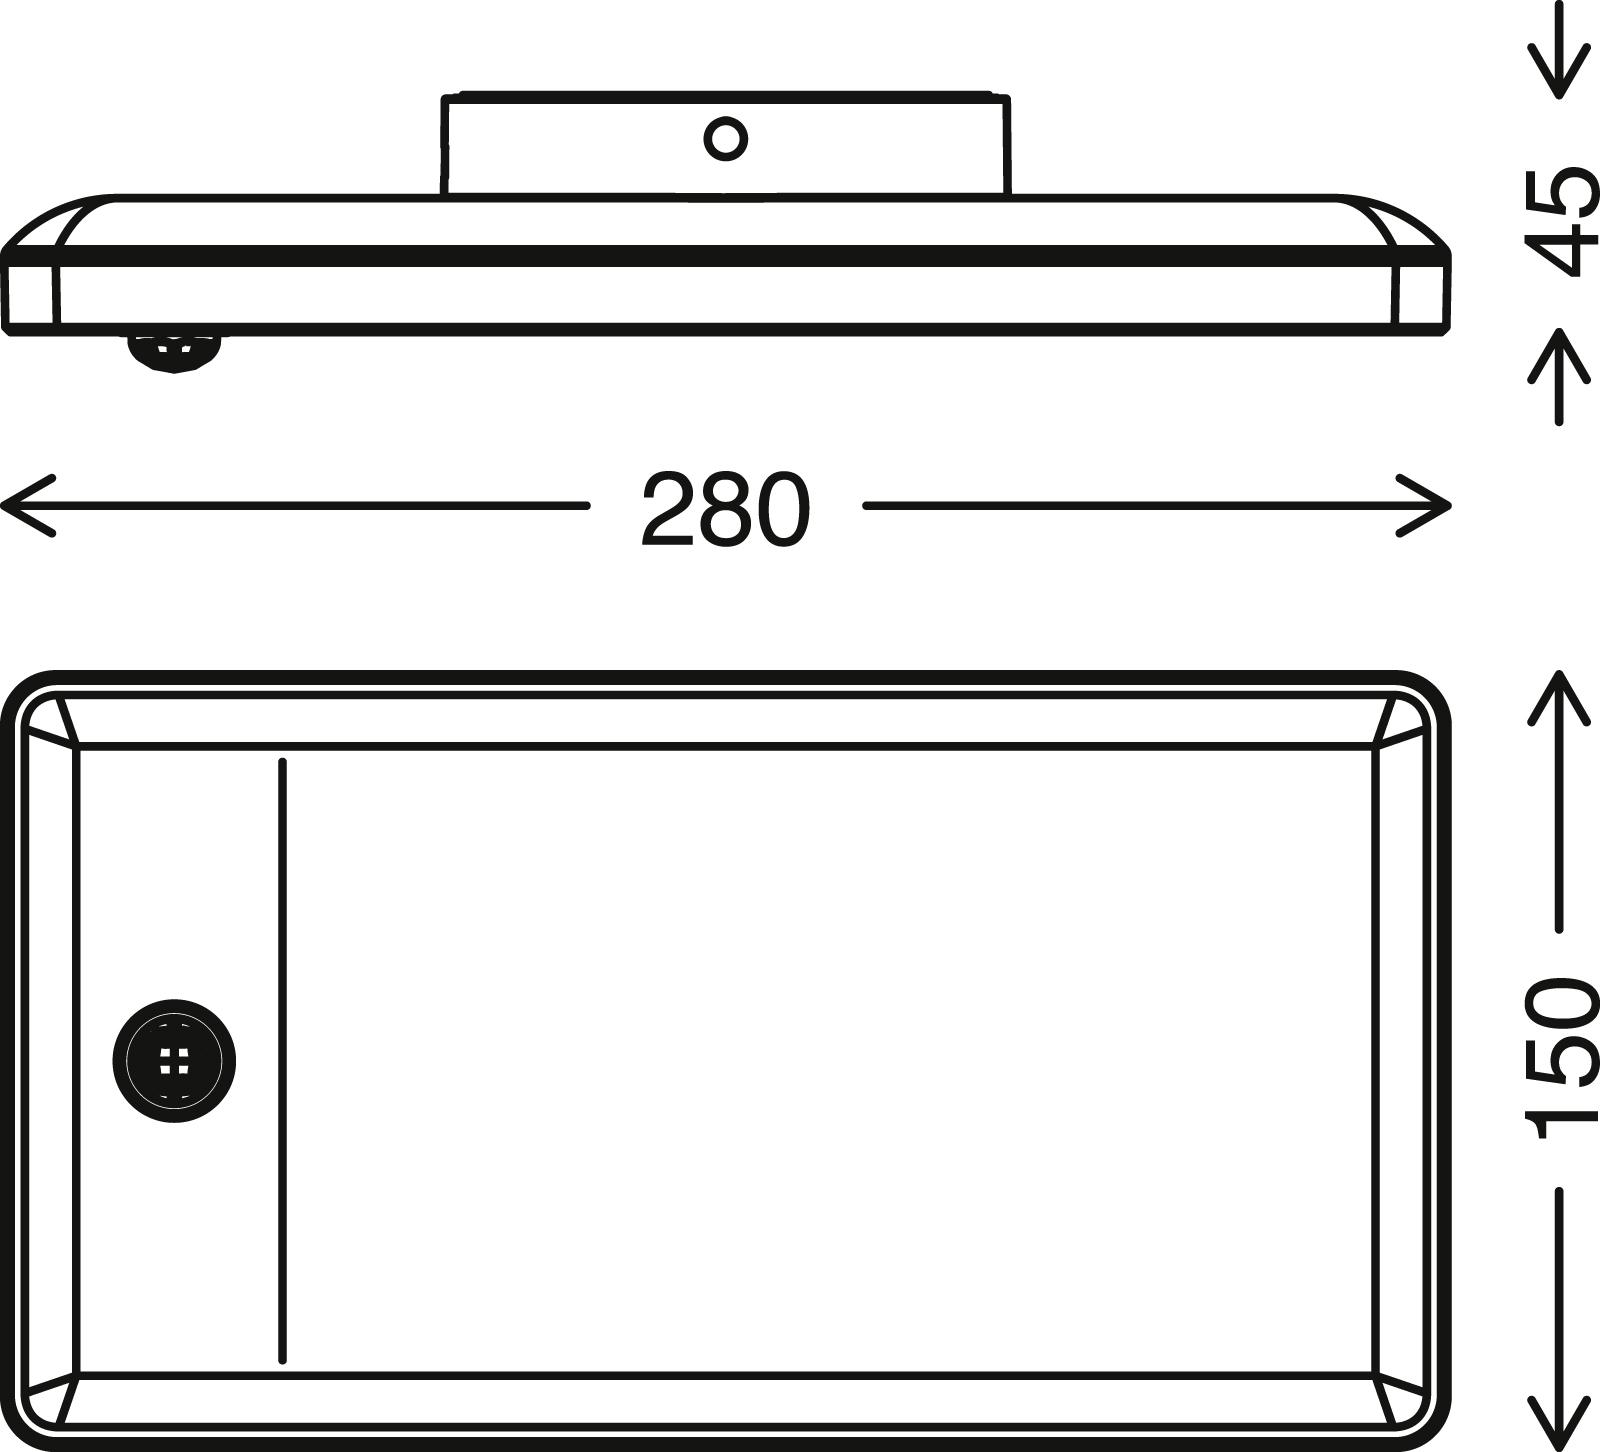 TELEFUNKEN LED Sensor Aussenwandleuchte, 28 cm, 16 W, Schwarz